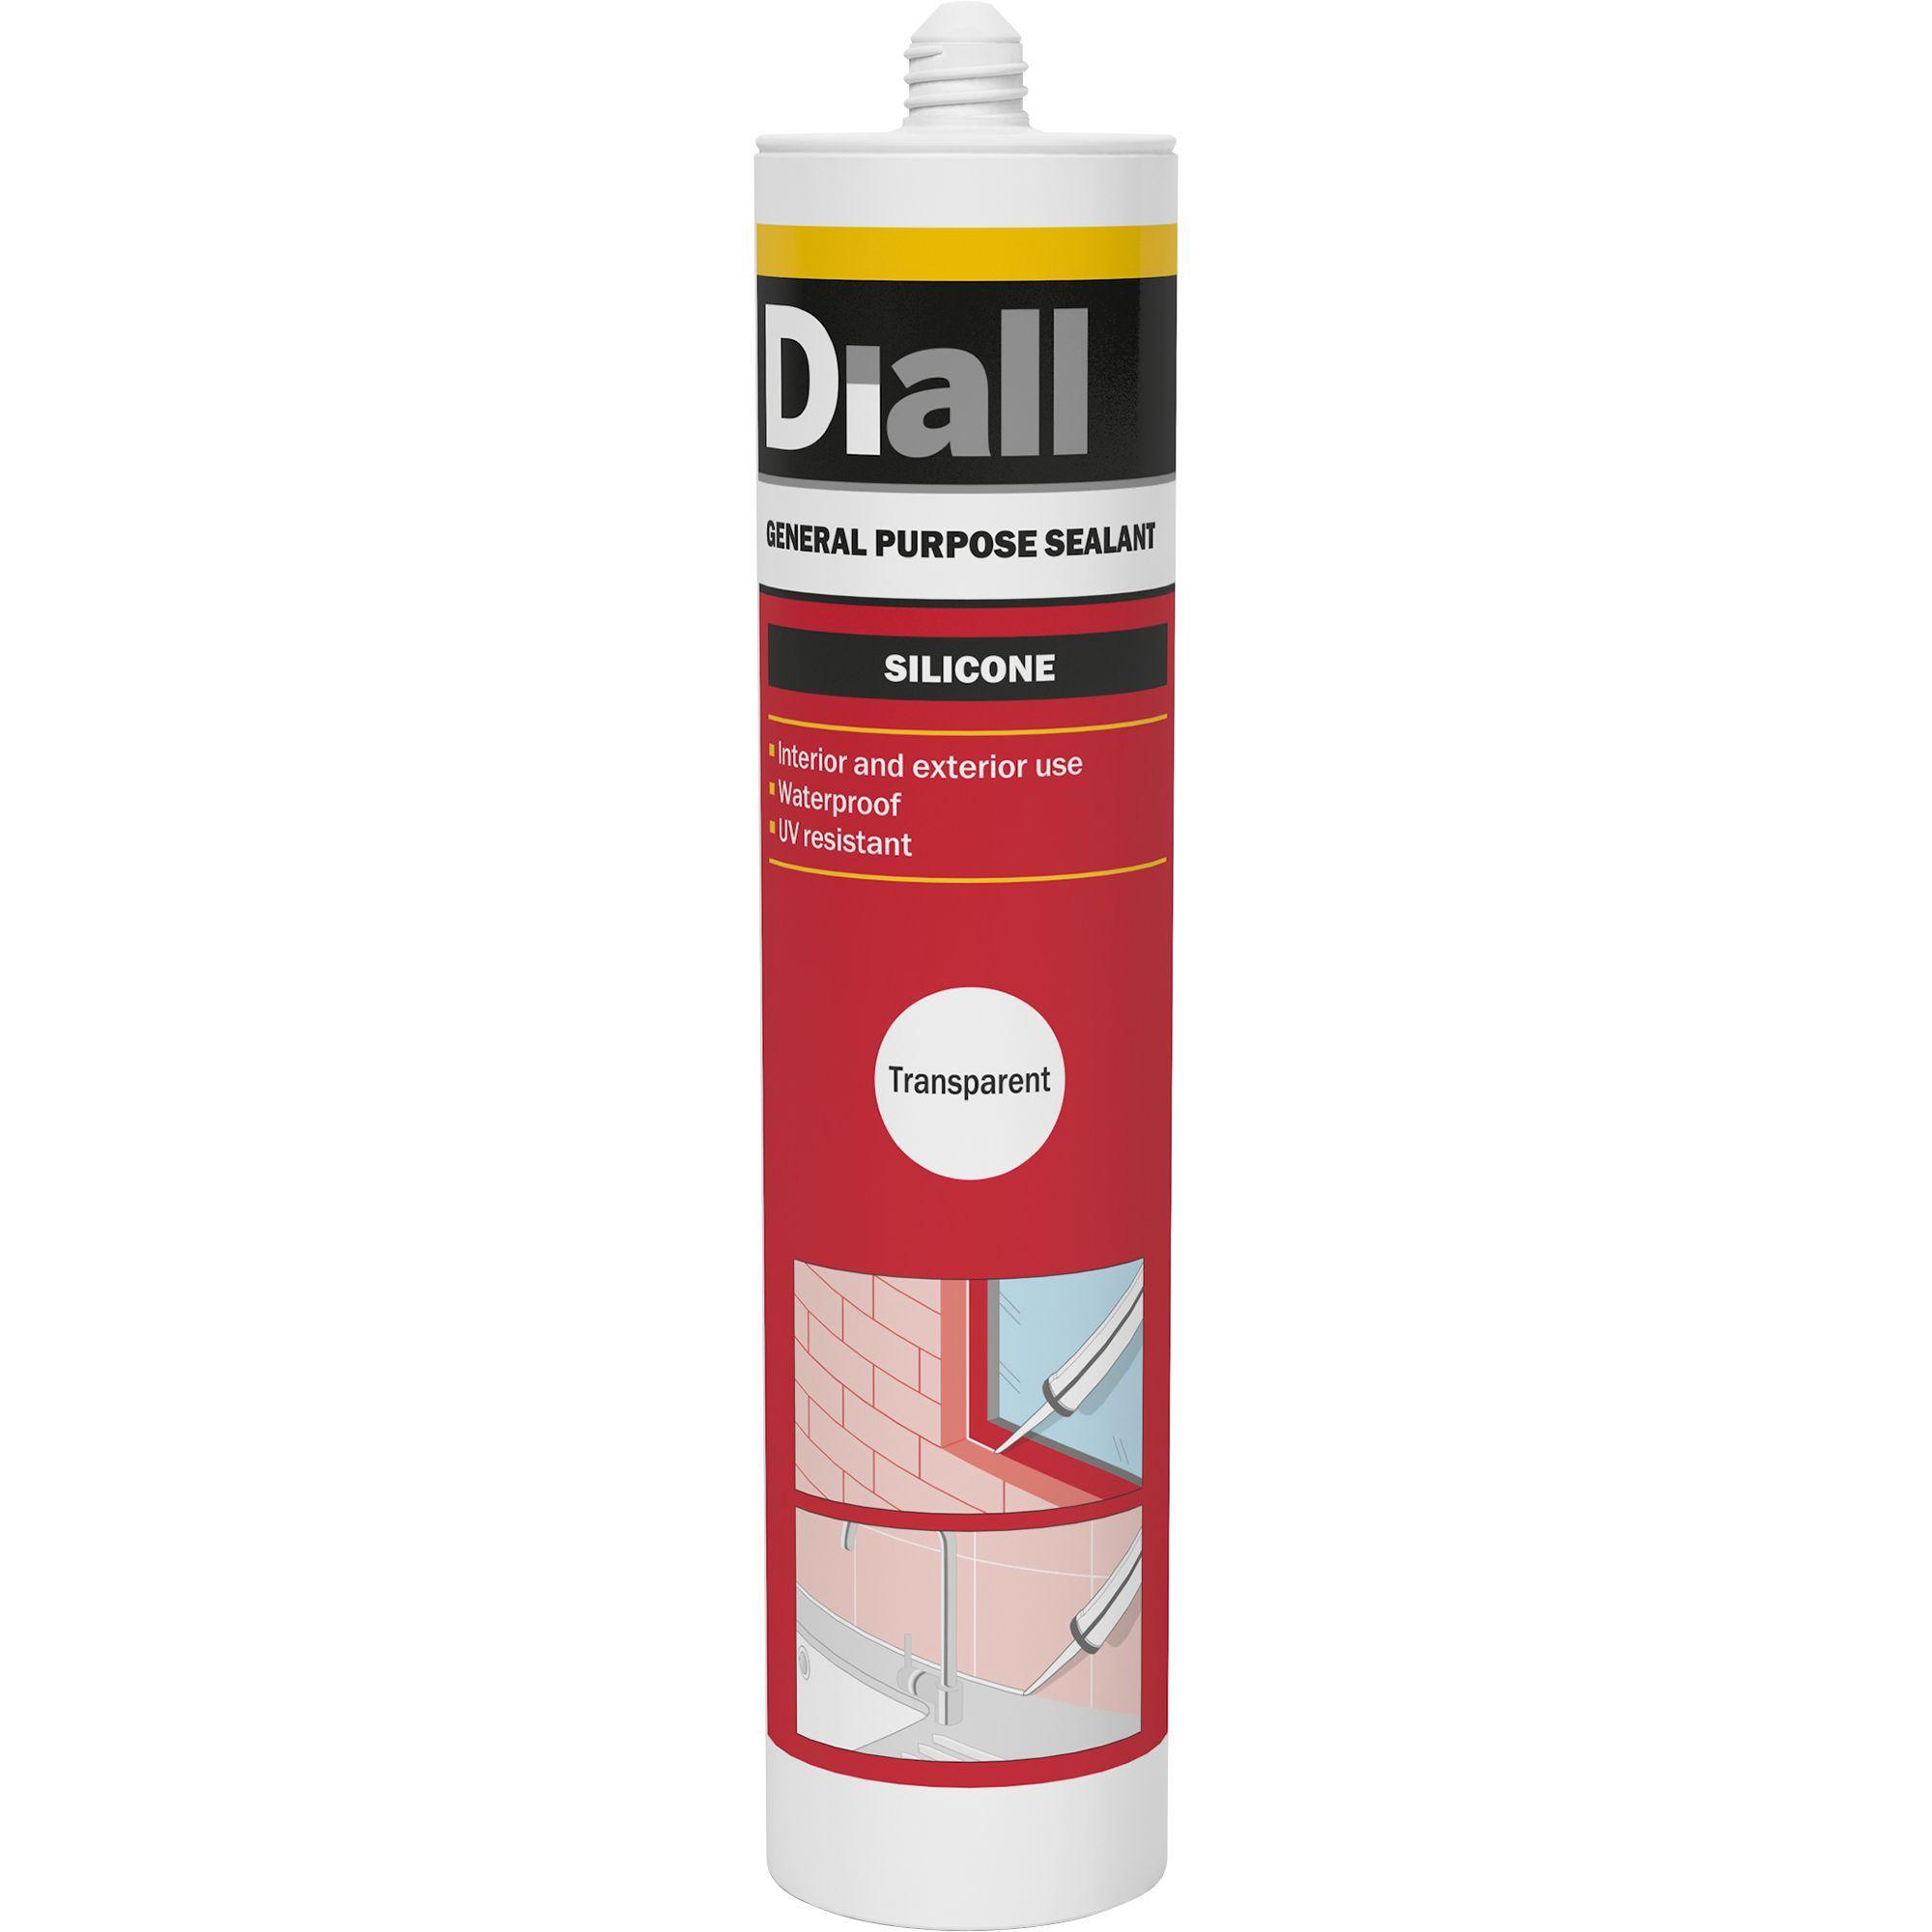 Diall Translucent General Purpose Sealant 300 Ml